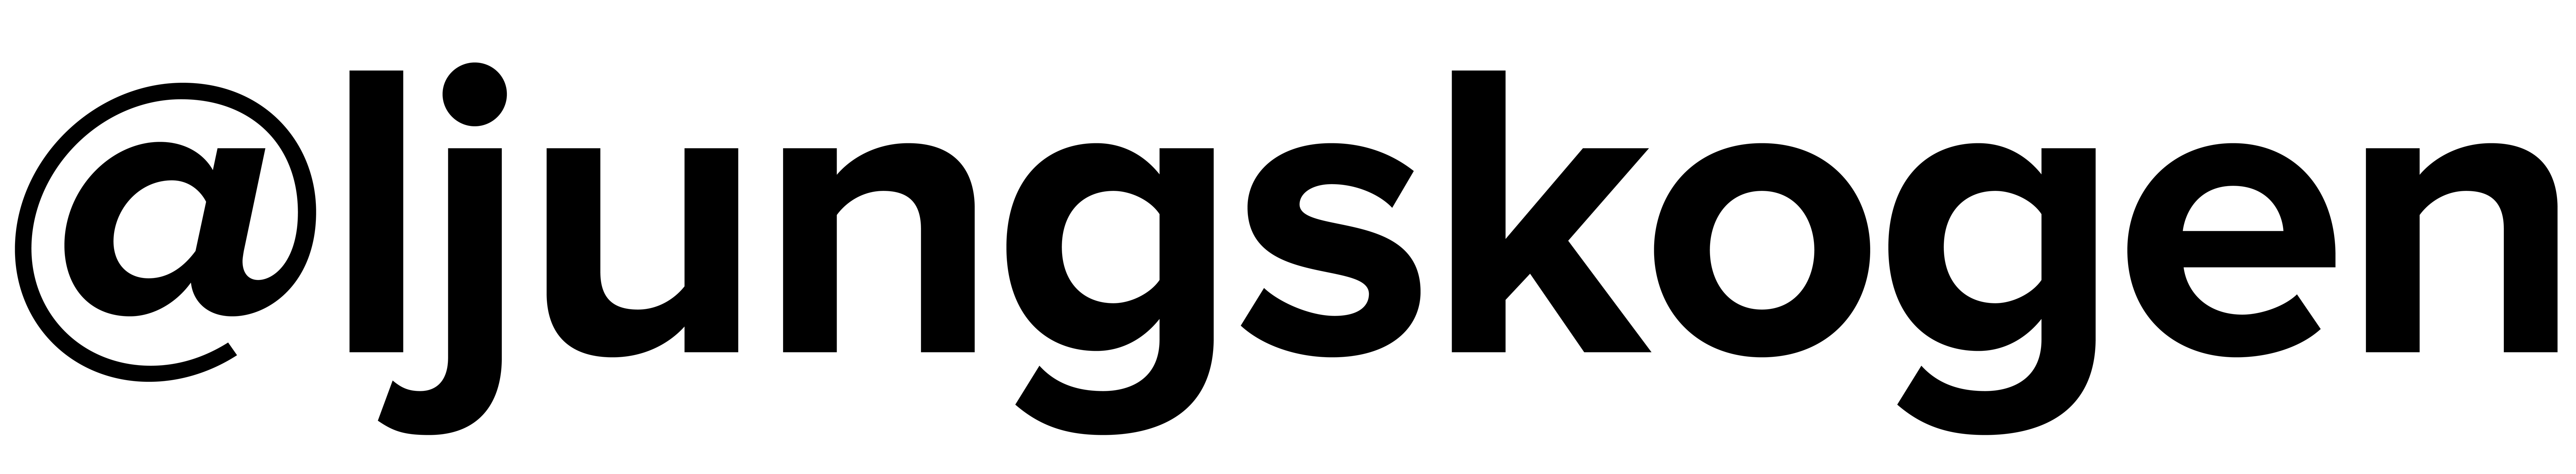 Logo @ljungskogen - Ljungskogen - #ljungskogen